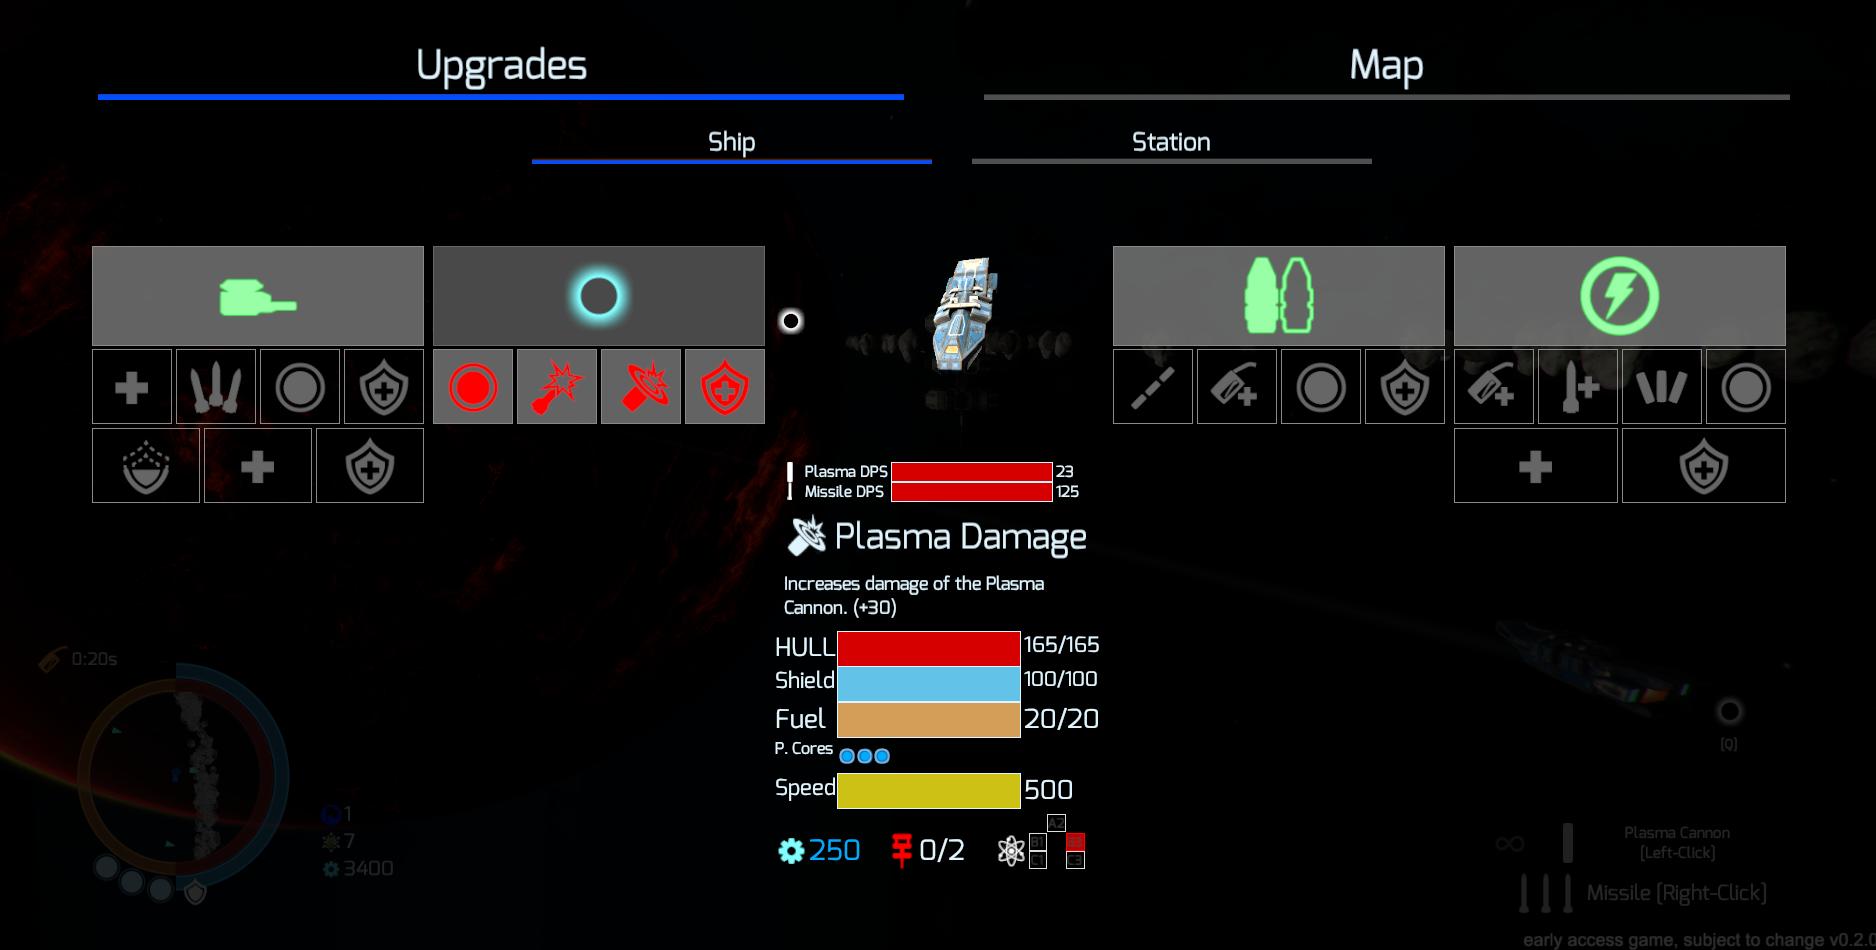 upgradeScreen.png